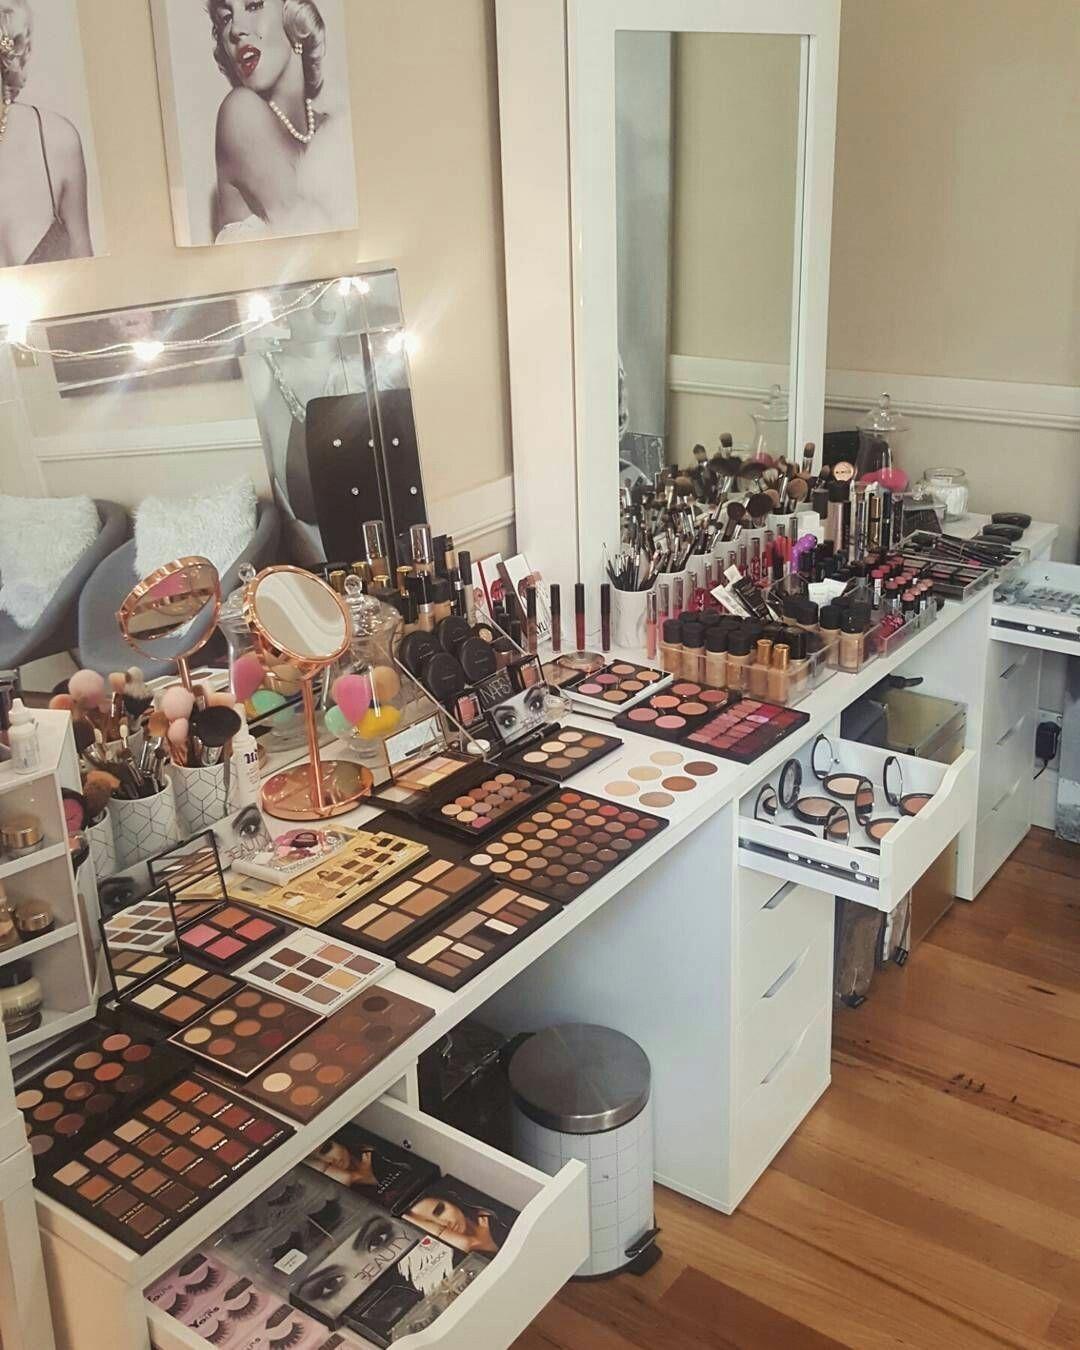 Pin by Rosalyn Jiménez on beauty » bar Makeup rooms